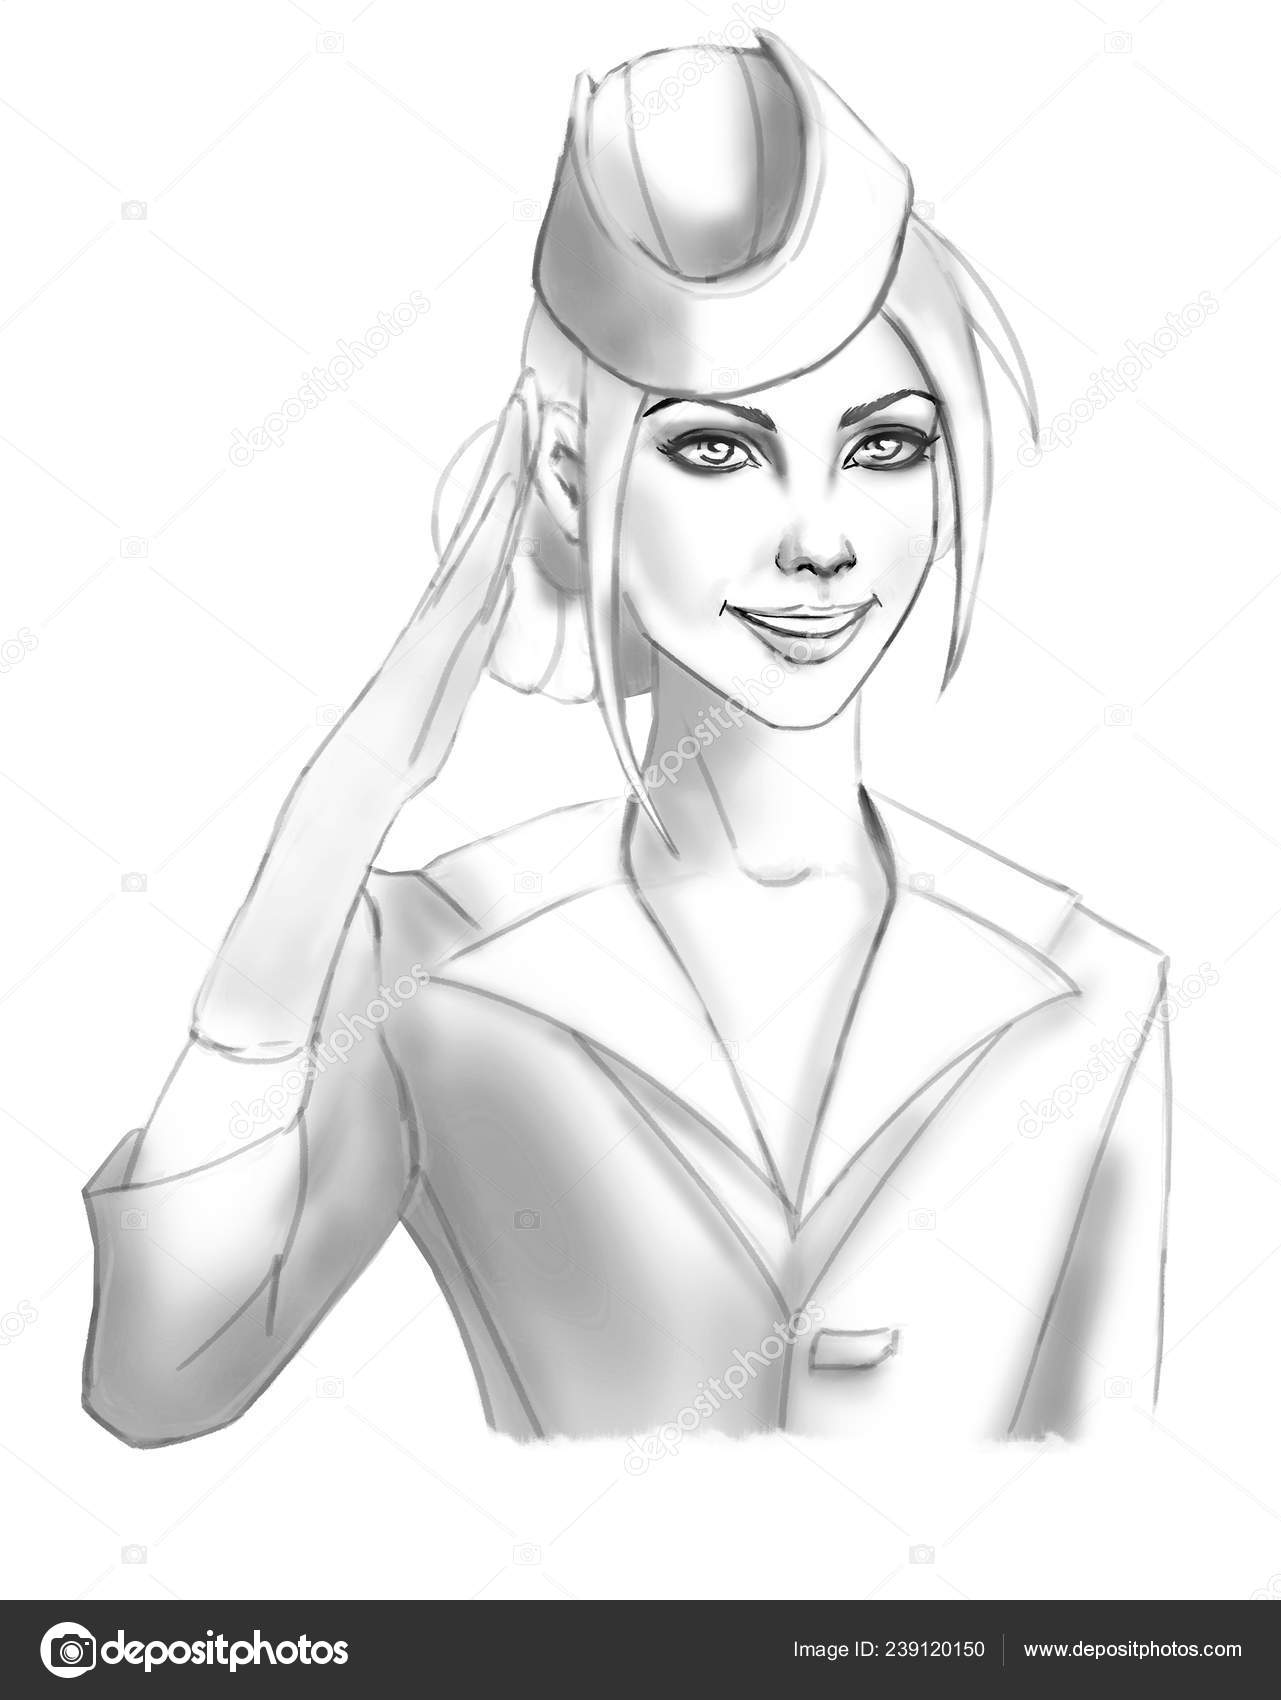 Female cartoon drawing young beautiful comic cartoon